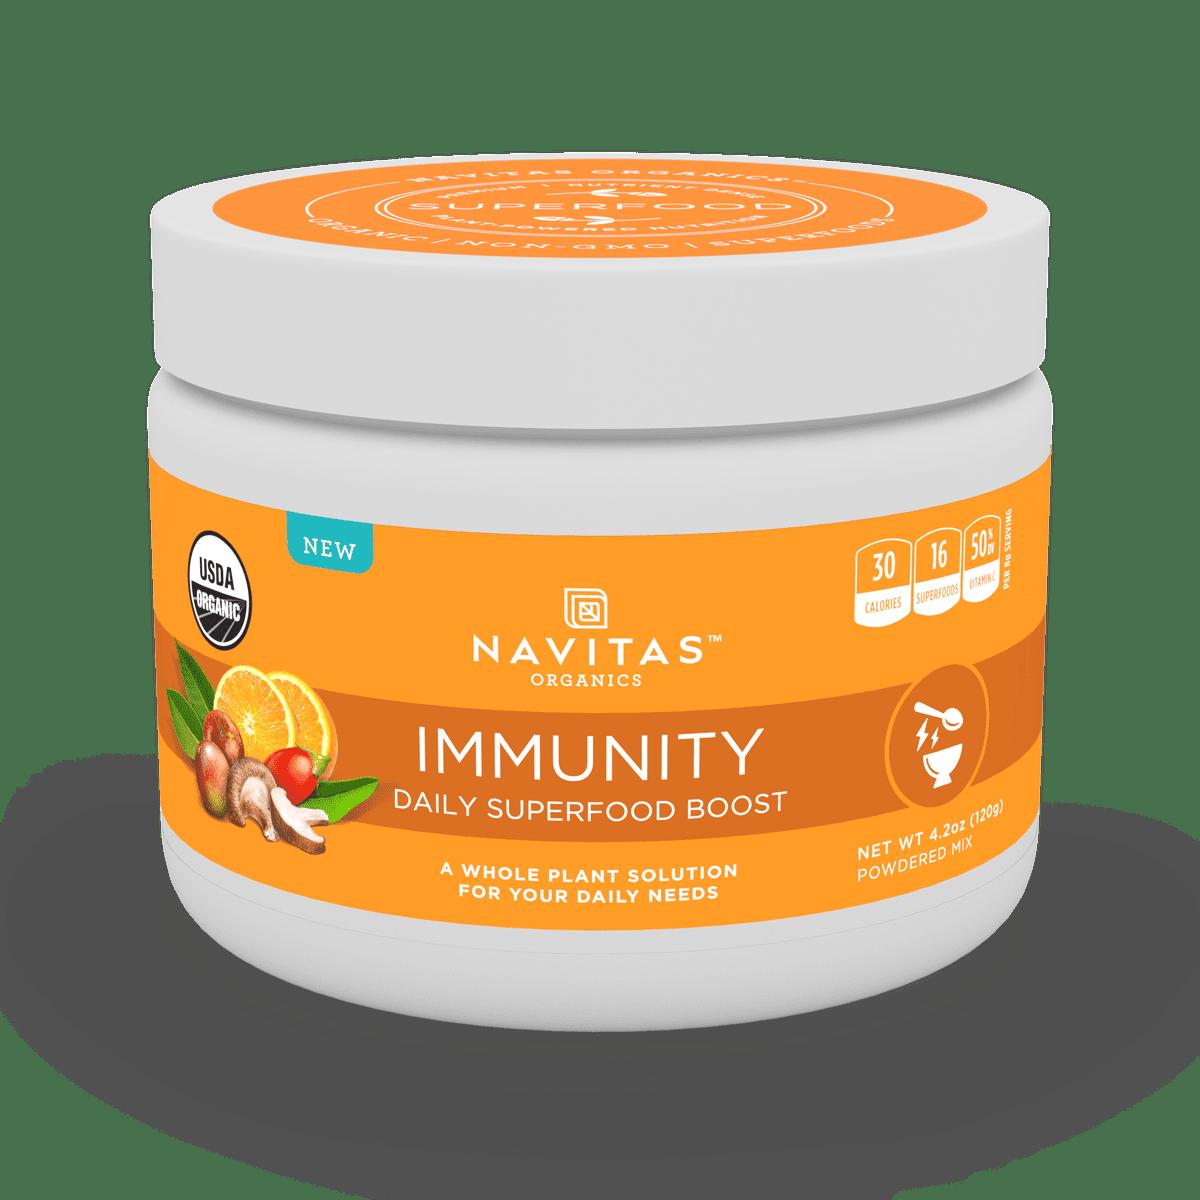 Navitas Organics Daily Immunity Superfood Powder, 4.2 Oz, 15 Servings